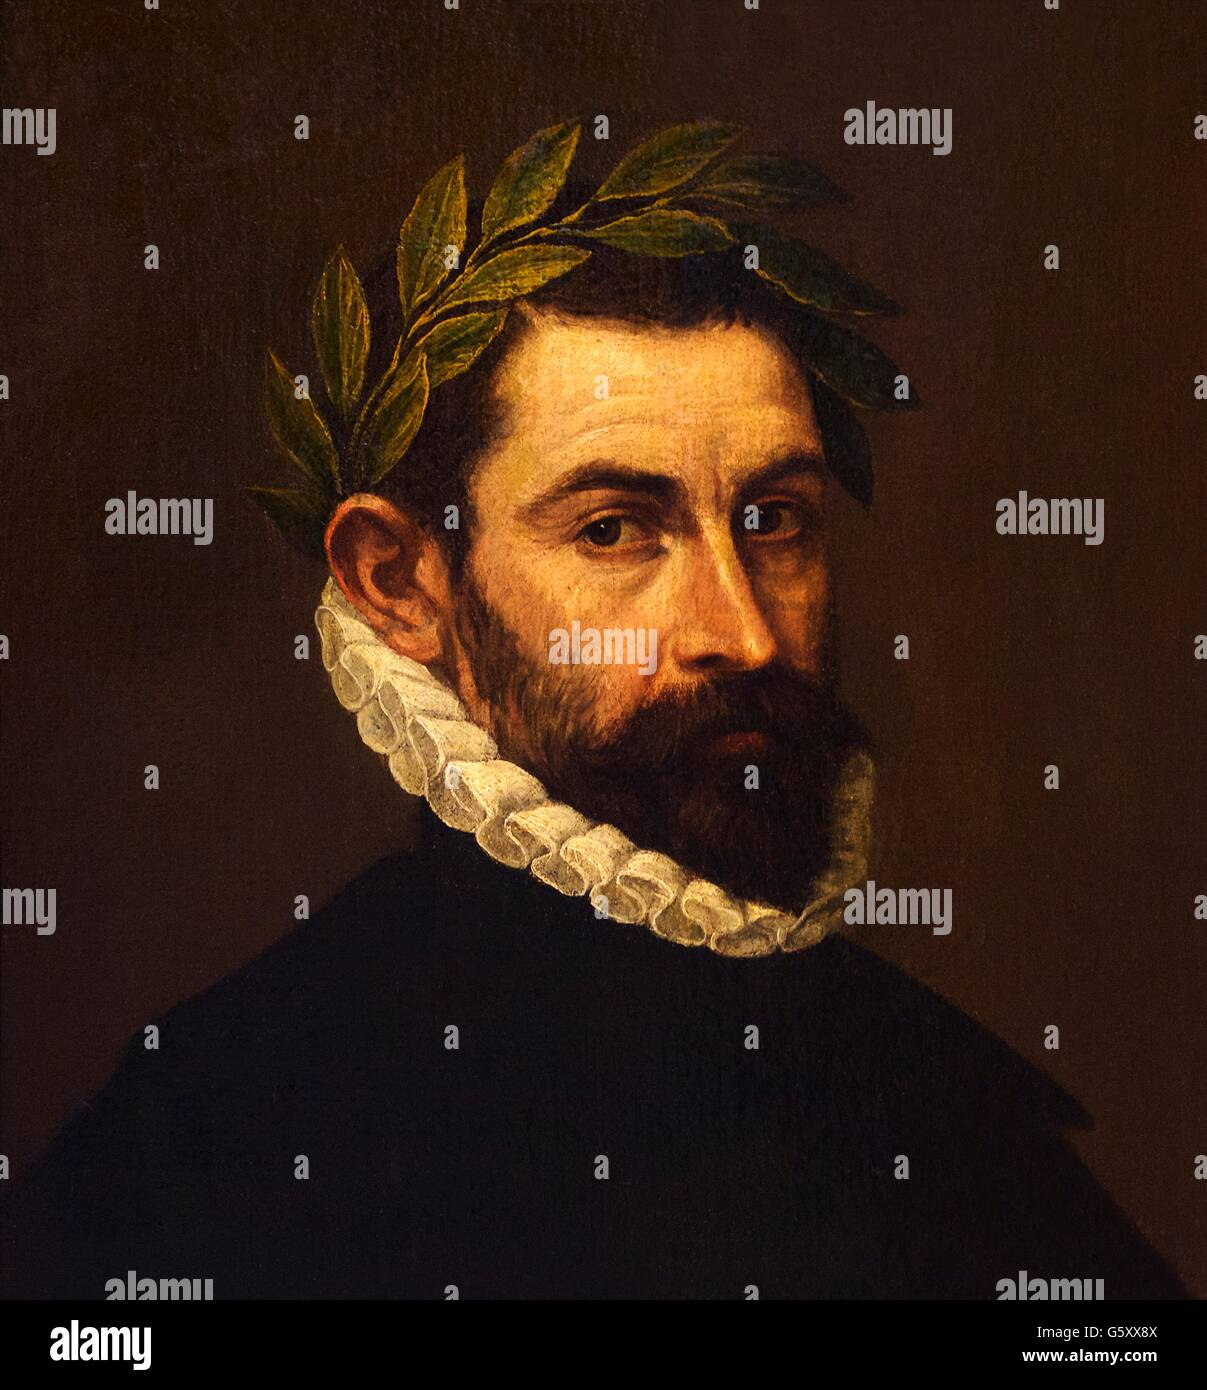 Portrait of the Poet Alonso Ercilla y Zuniga, 1576-1577, El Greco,  Hermitage State Museum, Saint Petersburg, Russia - Stock Image